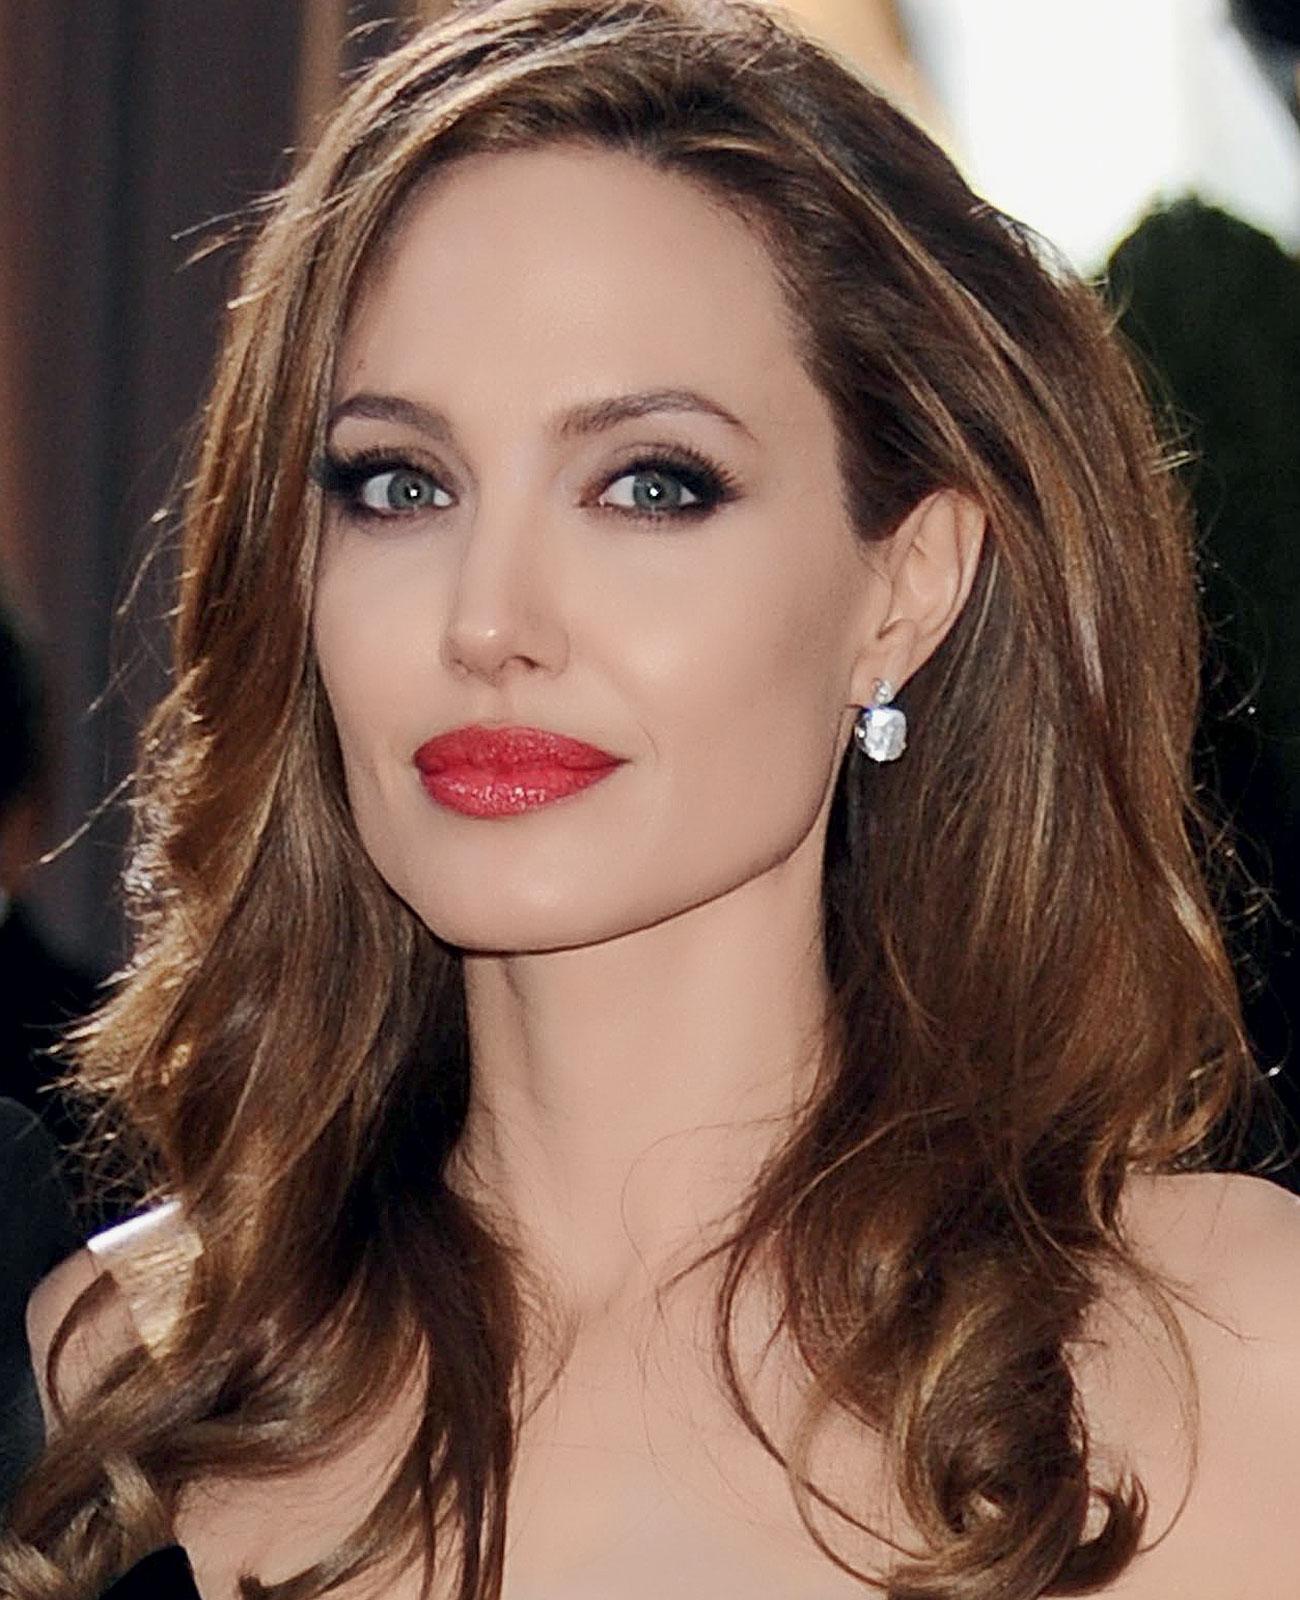 http://4.bp.blogspot.com/-Pz3peGXJ7Ek/UQ8XgJwGznI/AAAAAAAAMxA/DbZbZy0jA0E/s1600/Angelina+Jolie.jpg